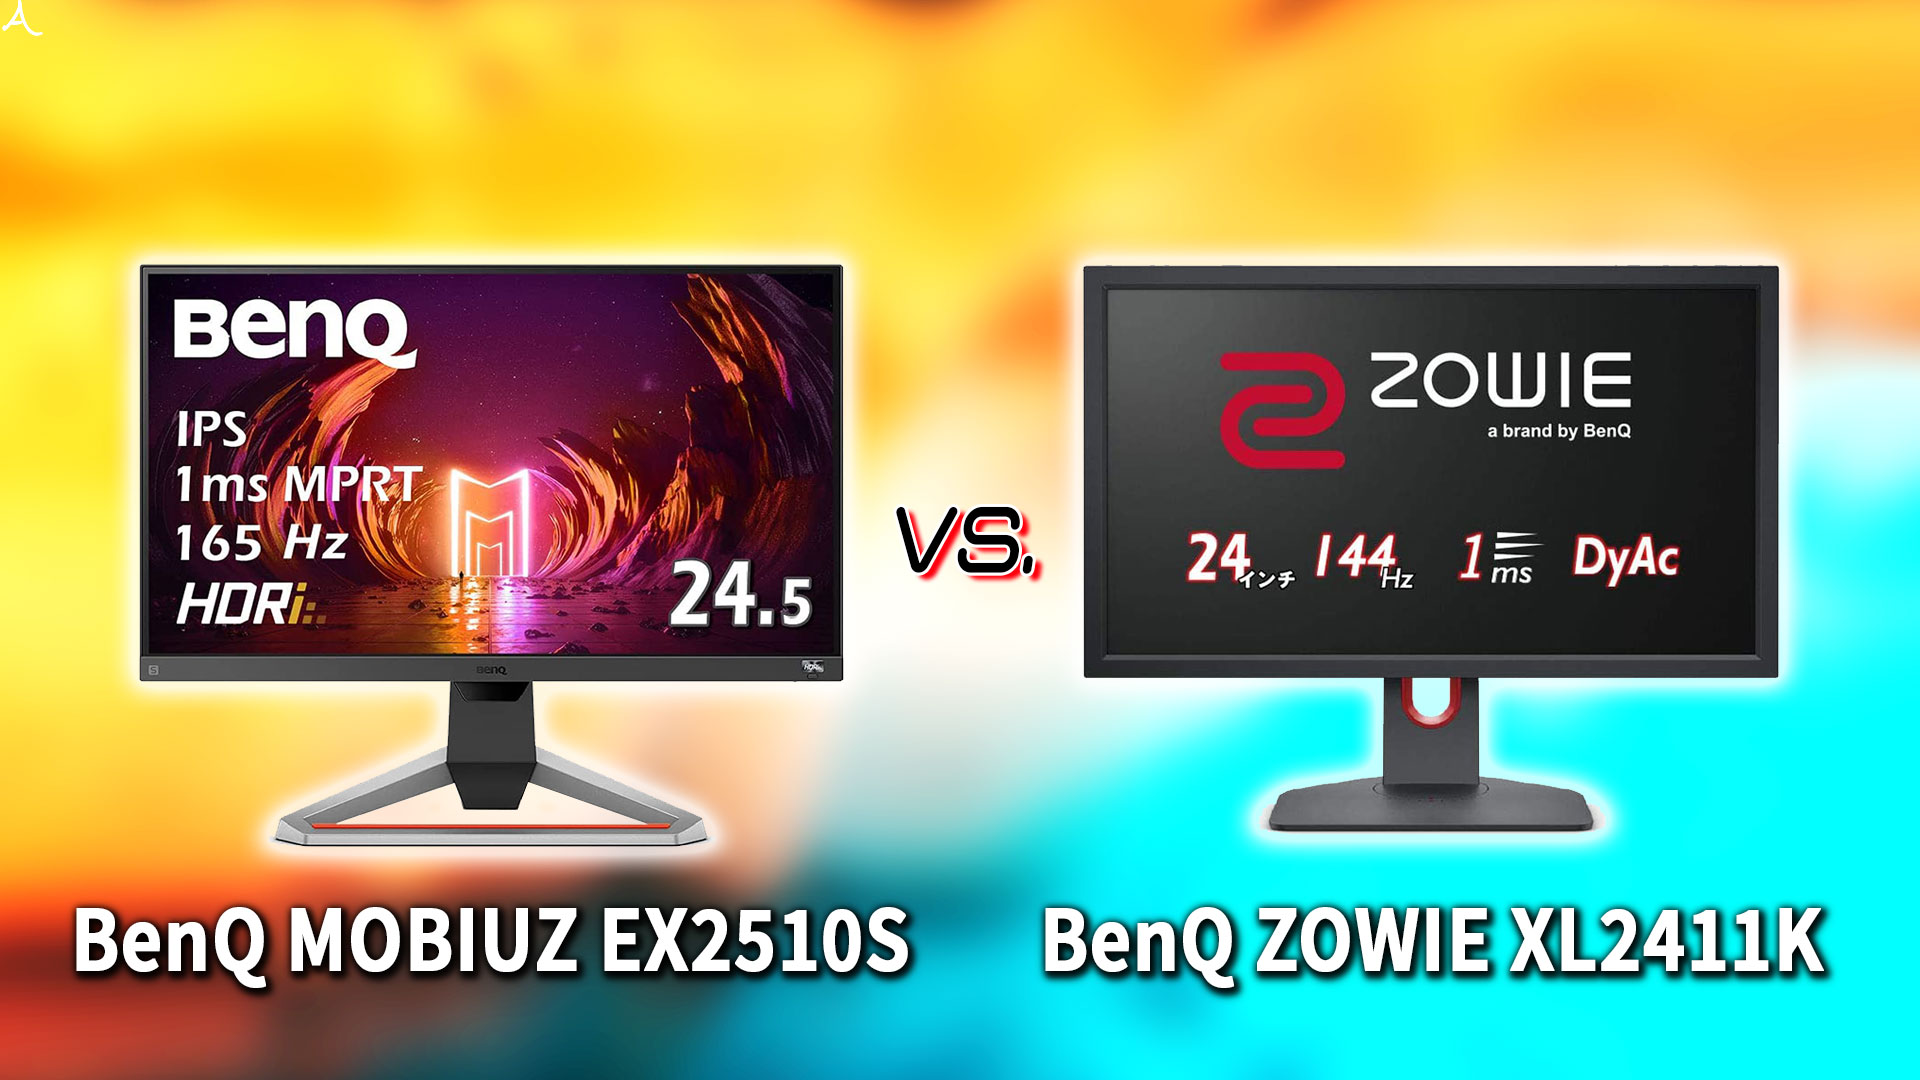 「BenQ MOBIUZ EX2510S」と「ZOWIE XL2411K」の違いを比較:どっちを買う?